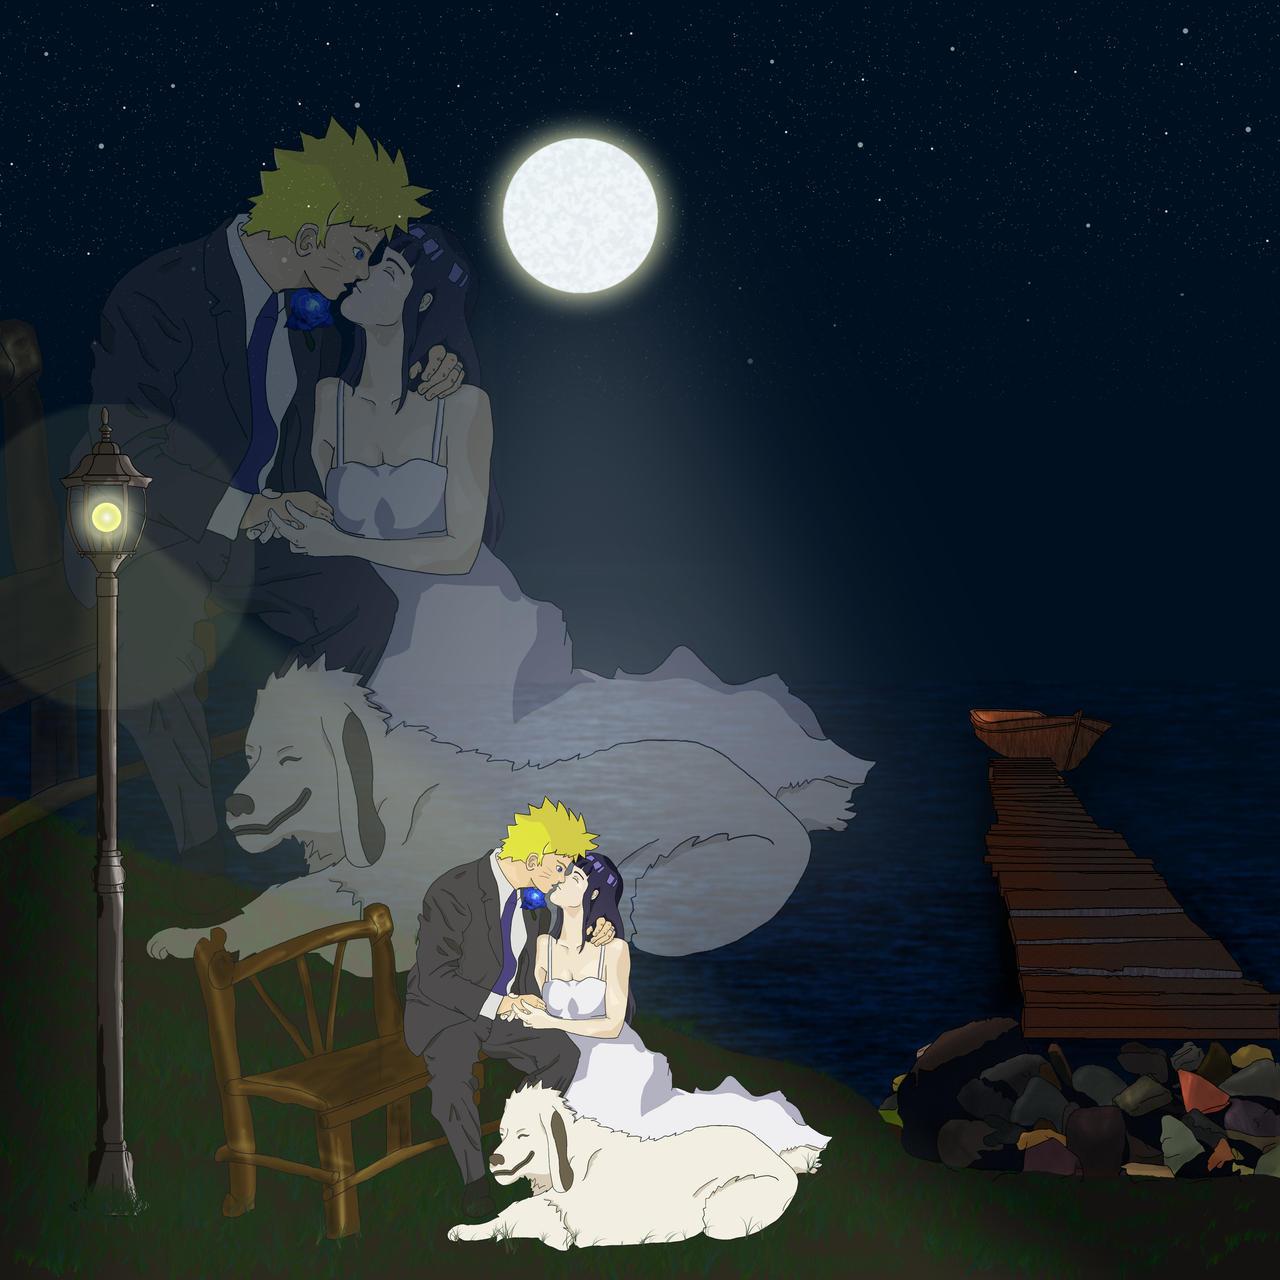 Naruto Hinata Wedding Night By Creepingninja On DeviantArt